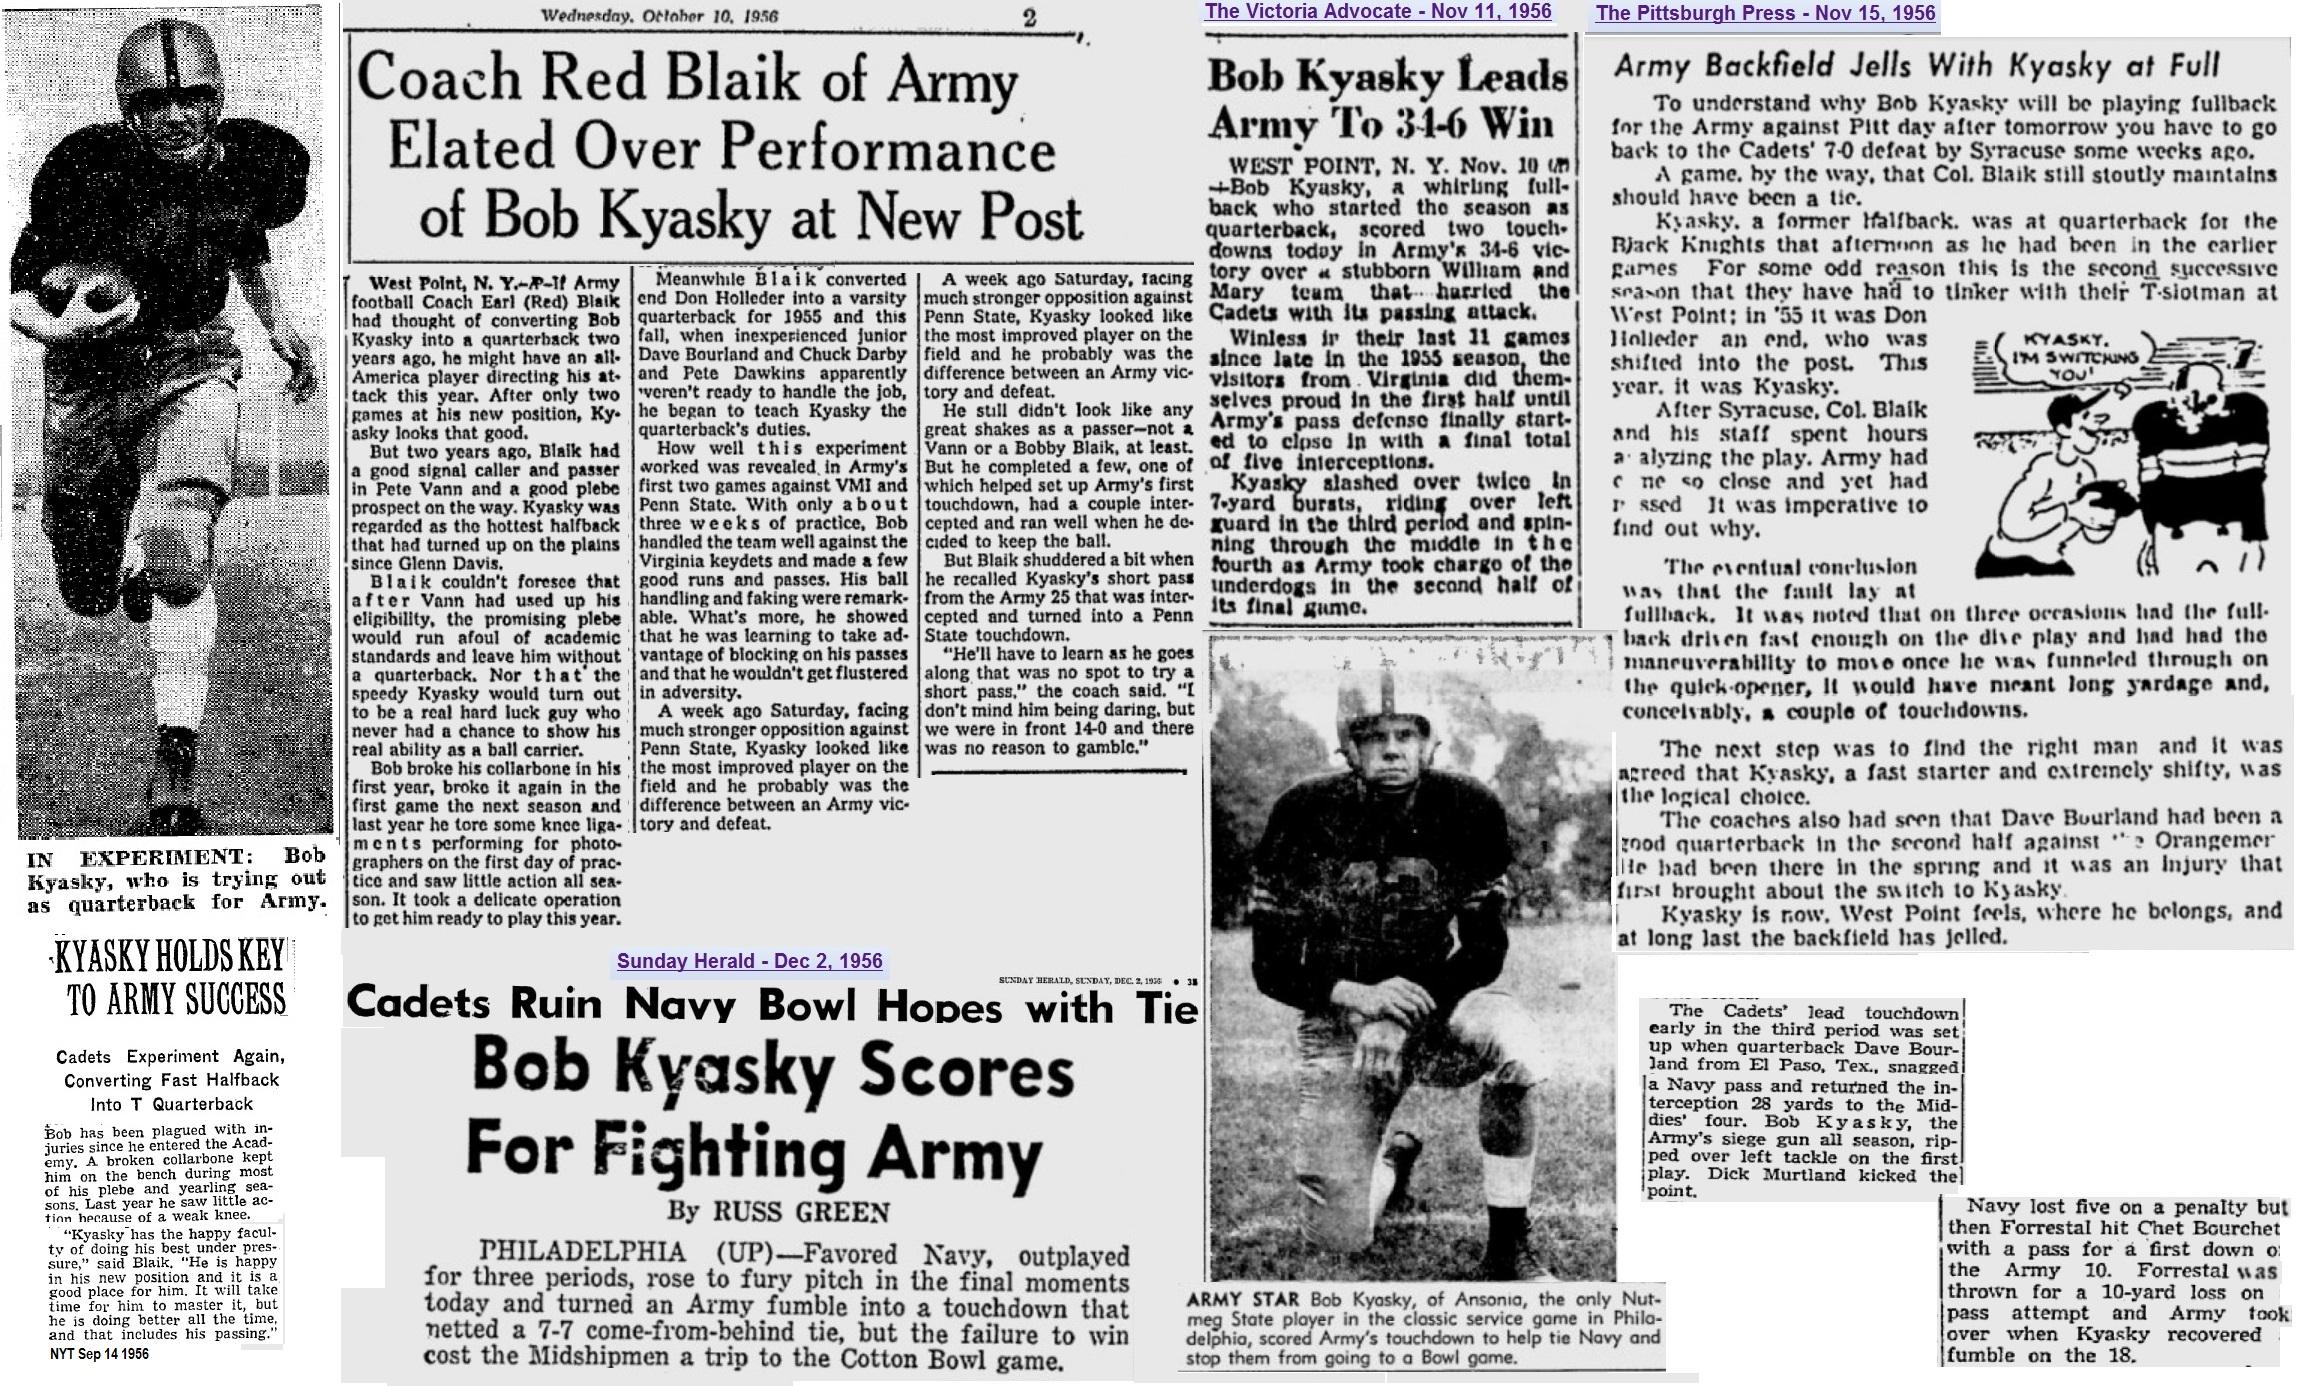 ArmyFB_1956_BobKyasky_various_1956